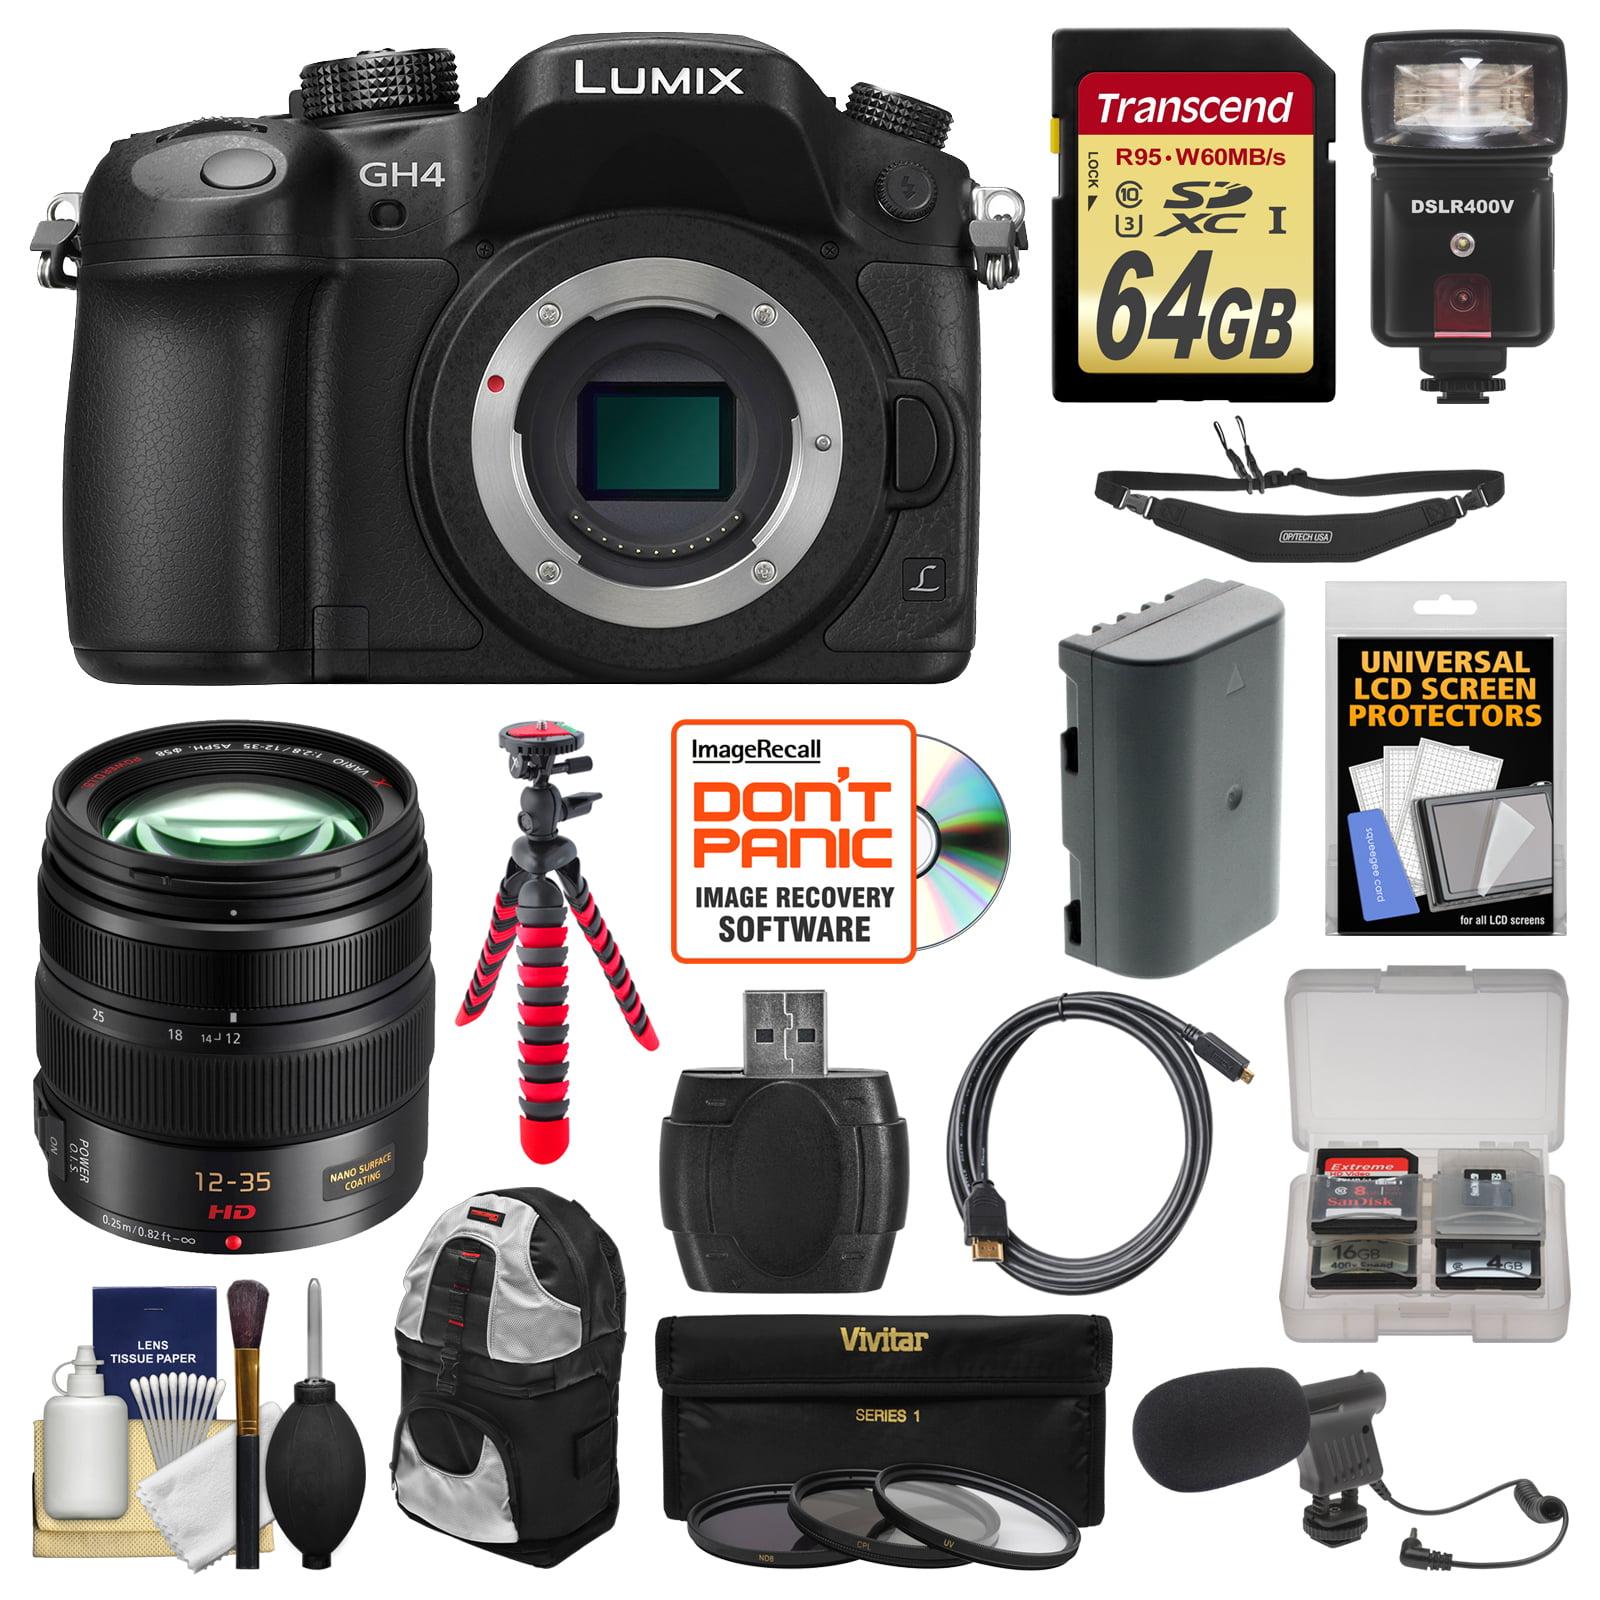 Panasonic Lumix DMC-GH4 4K Micro Four Thirds Digital Camera + 12-35mm f 2.8 Lens + 64GB Card + Backpack +... by Panasonic